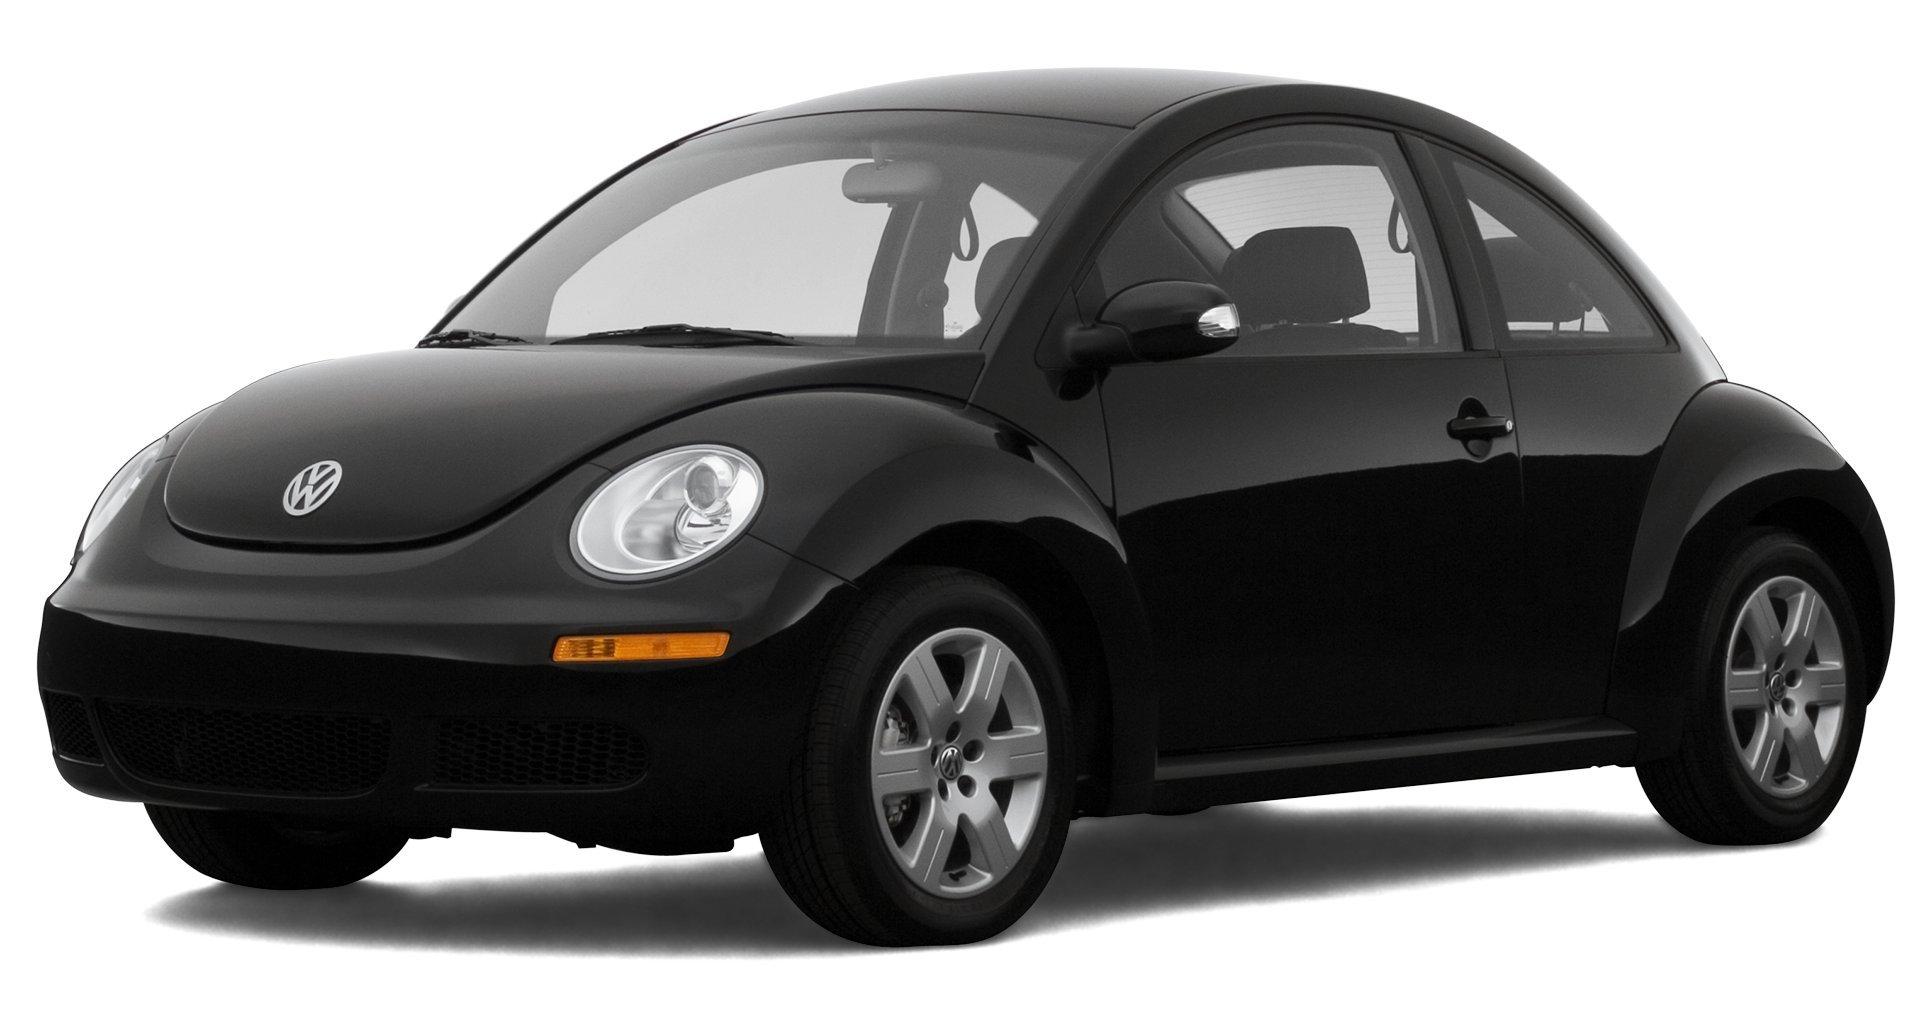 ... 2007 Volkswagen Beetle, 2-Door Automatic Transmission. 2007 Hyundai  Tiburon ...